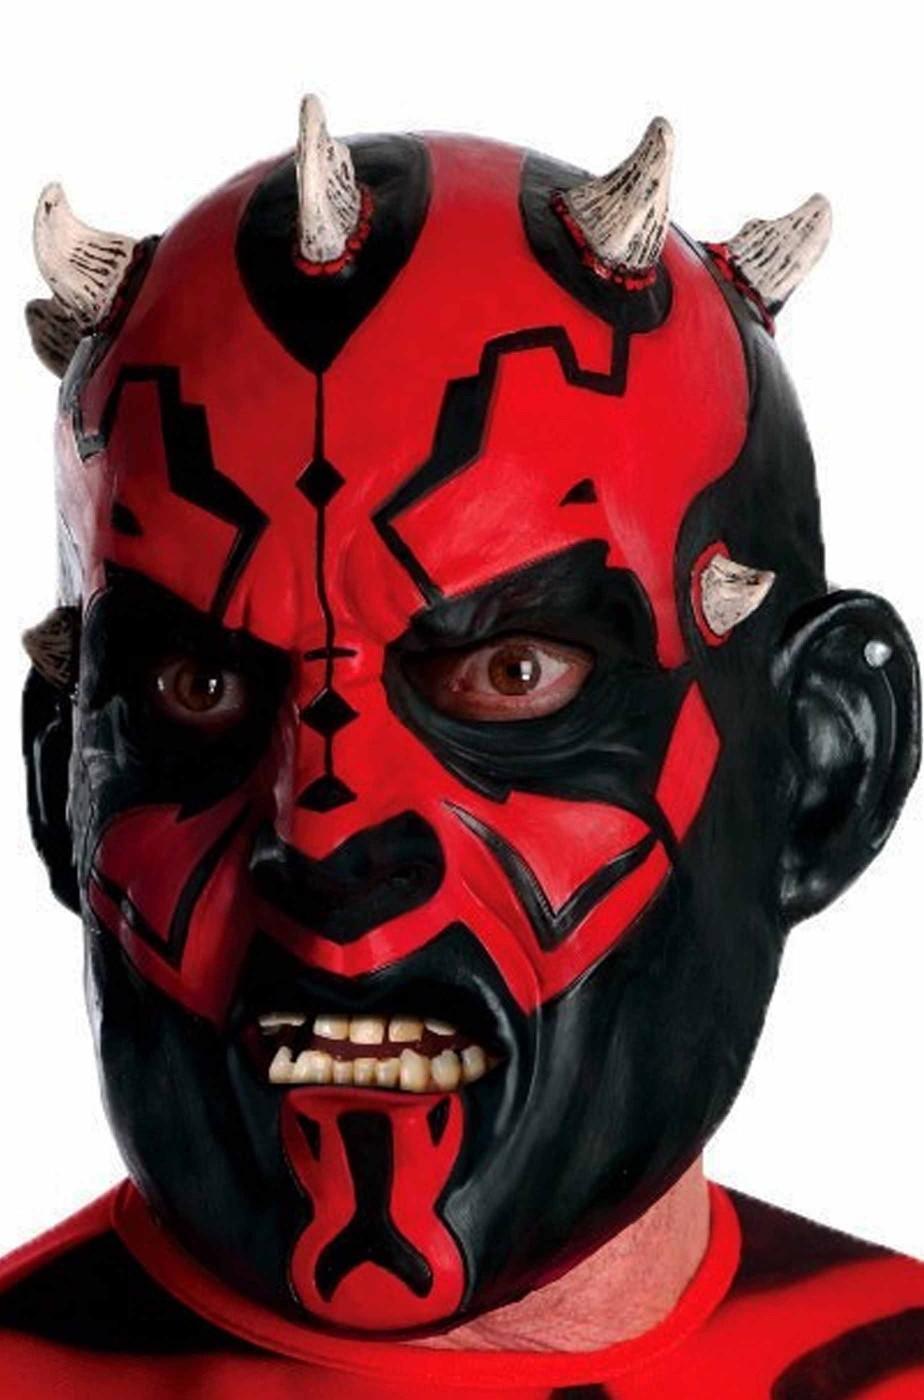 Maschera Darth Maul di Star Wars 3/4 in vinile